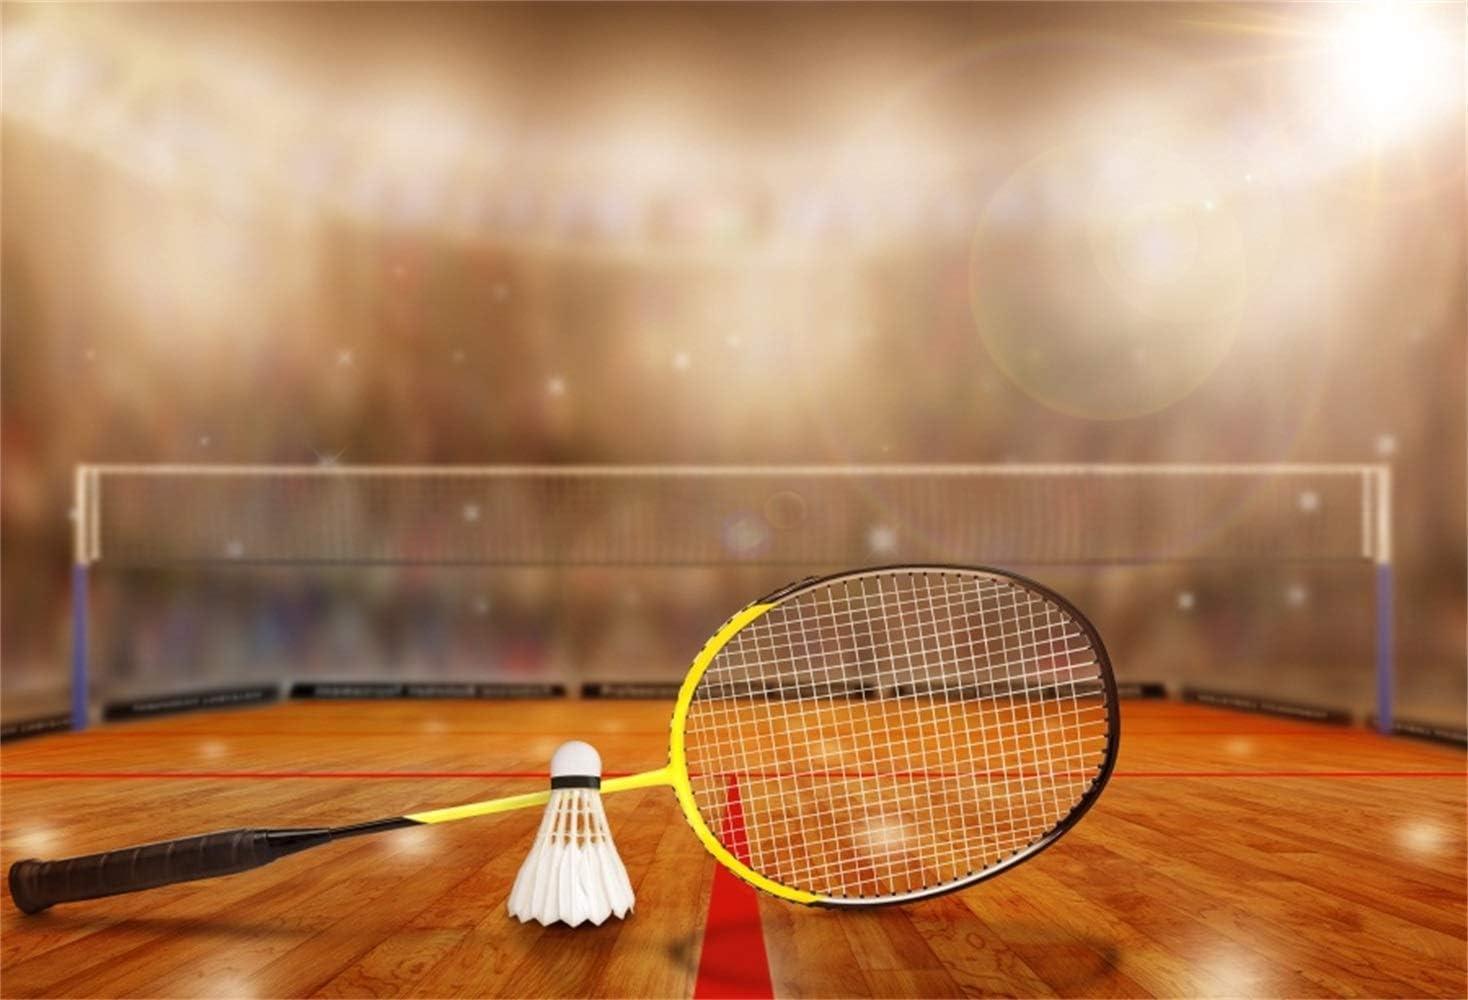 10x7ft Badminton Stadium Backdrop Vinyl Photography Background Badminton Racket Bokeh Sports Spectator Seats Badminton Match Athlete Children Kids Adult Portrait Shoot Video Studio Props